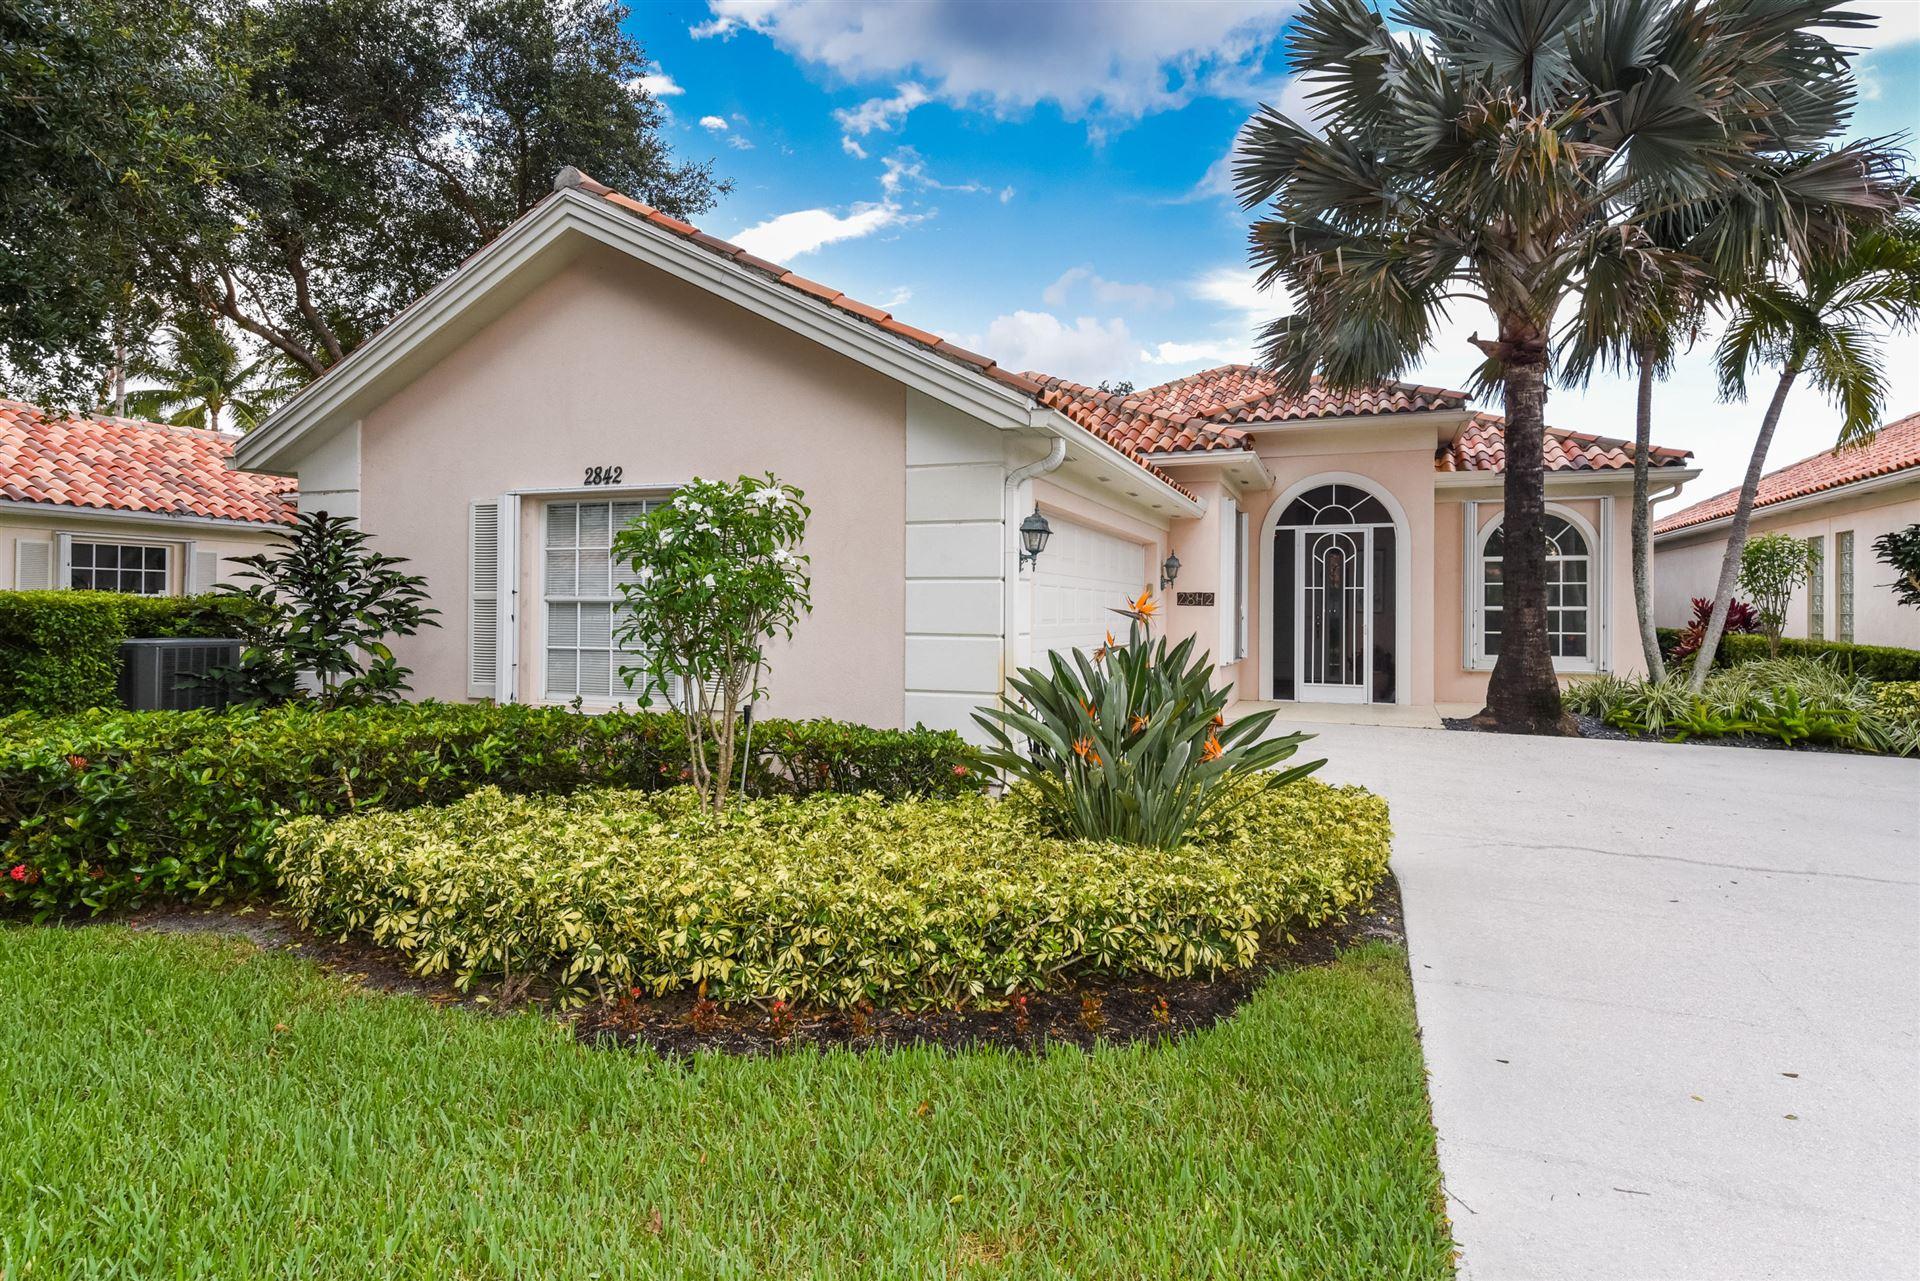 2842 Irma Lake Drive, West Palm Beach, FL 33411 - #: RX-10605390